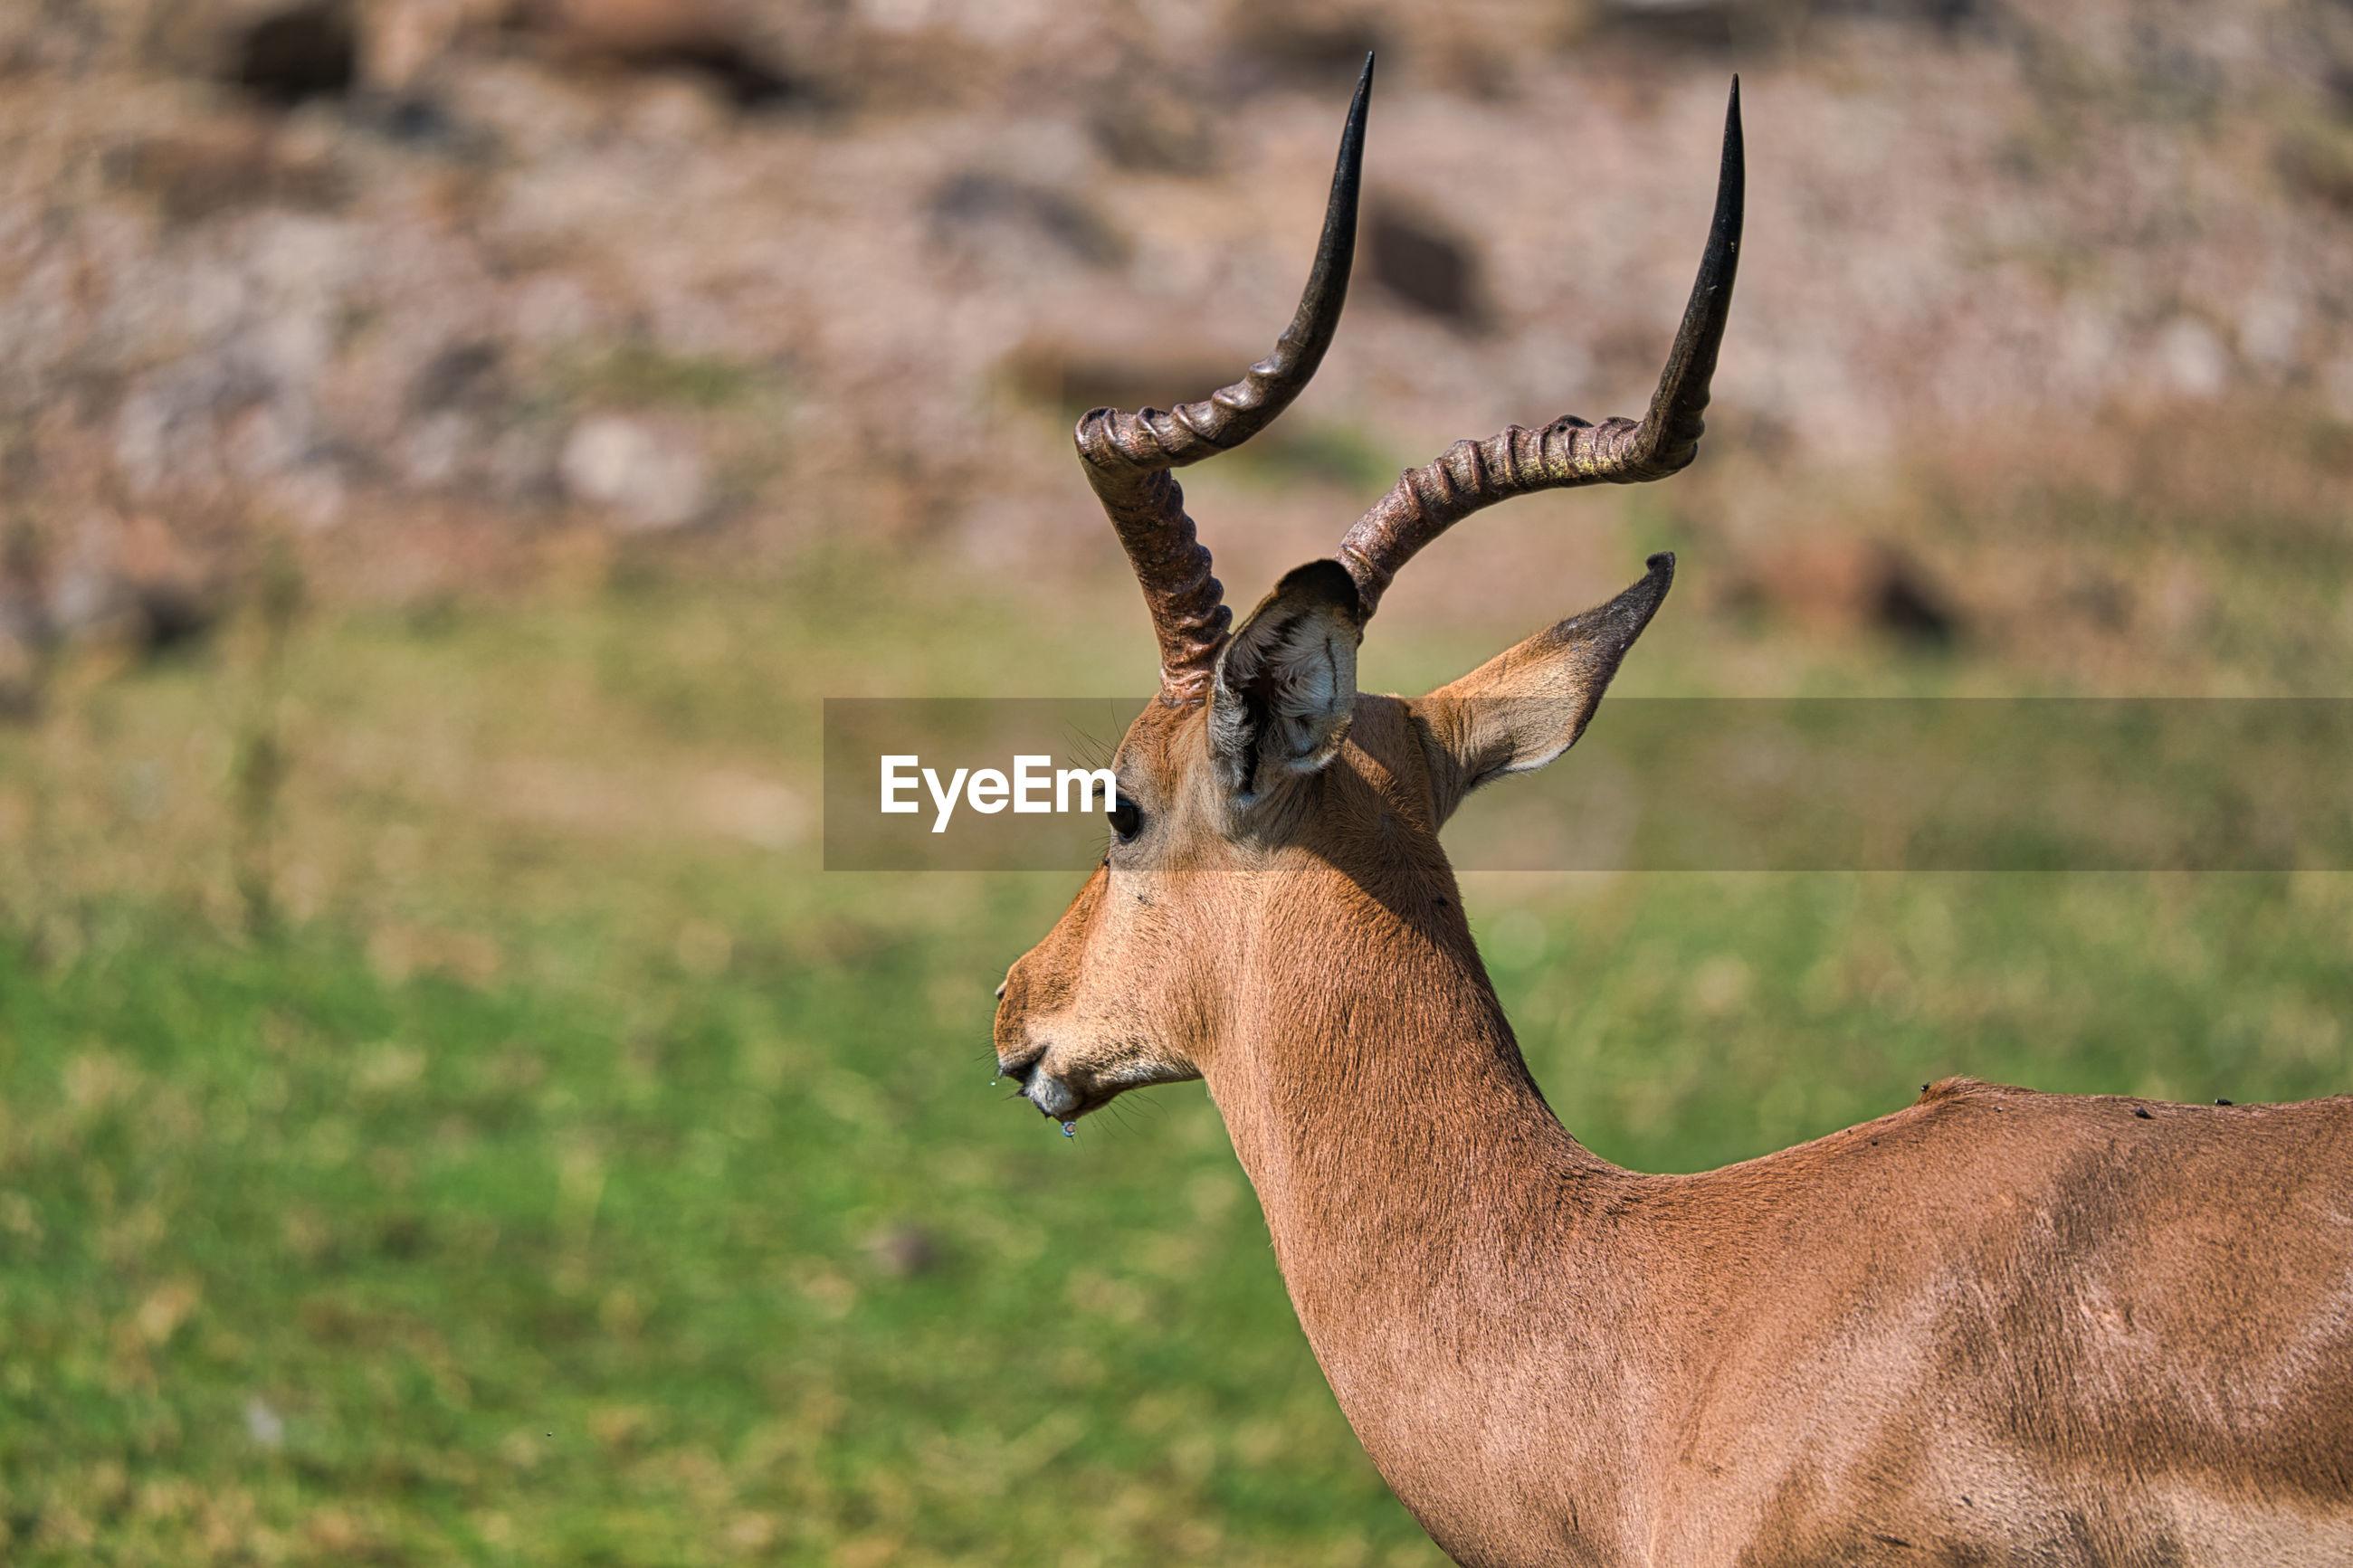 Antelope in chobe safari park, zimbabwe, africa